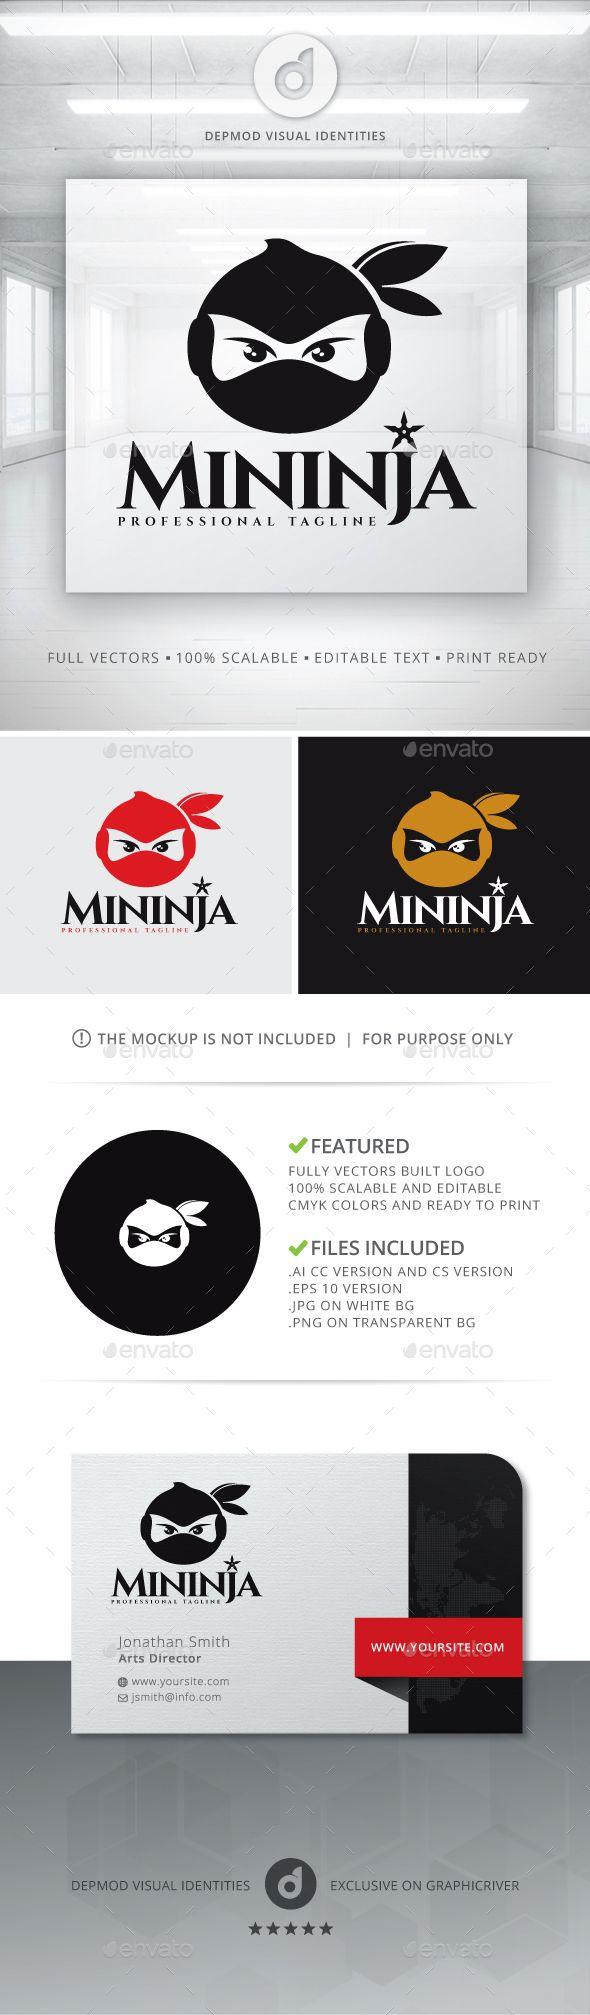 Minija Logo (With images) Marketing logo, Logo design